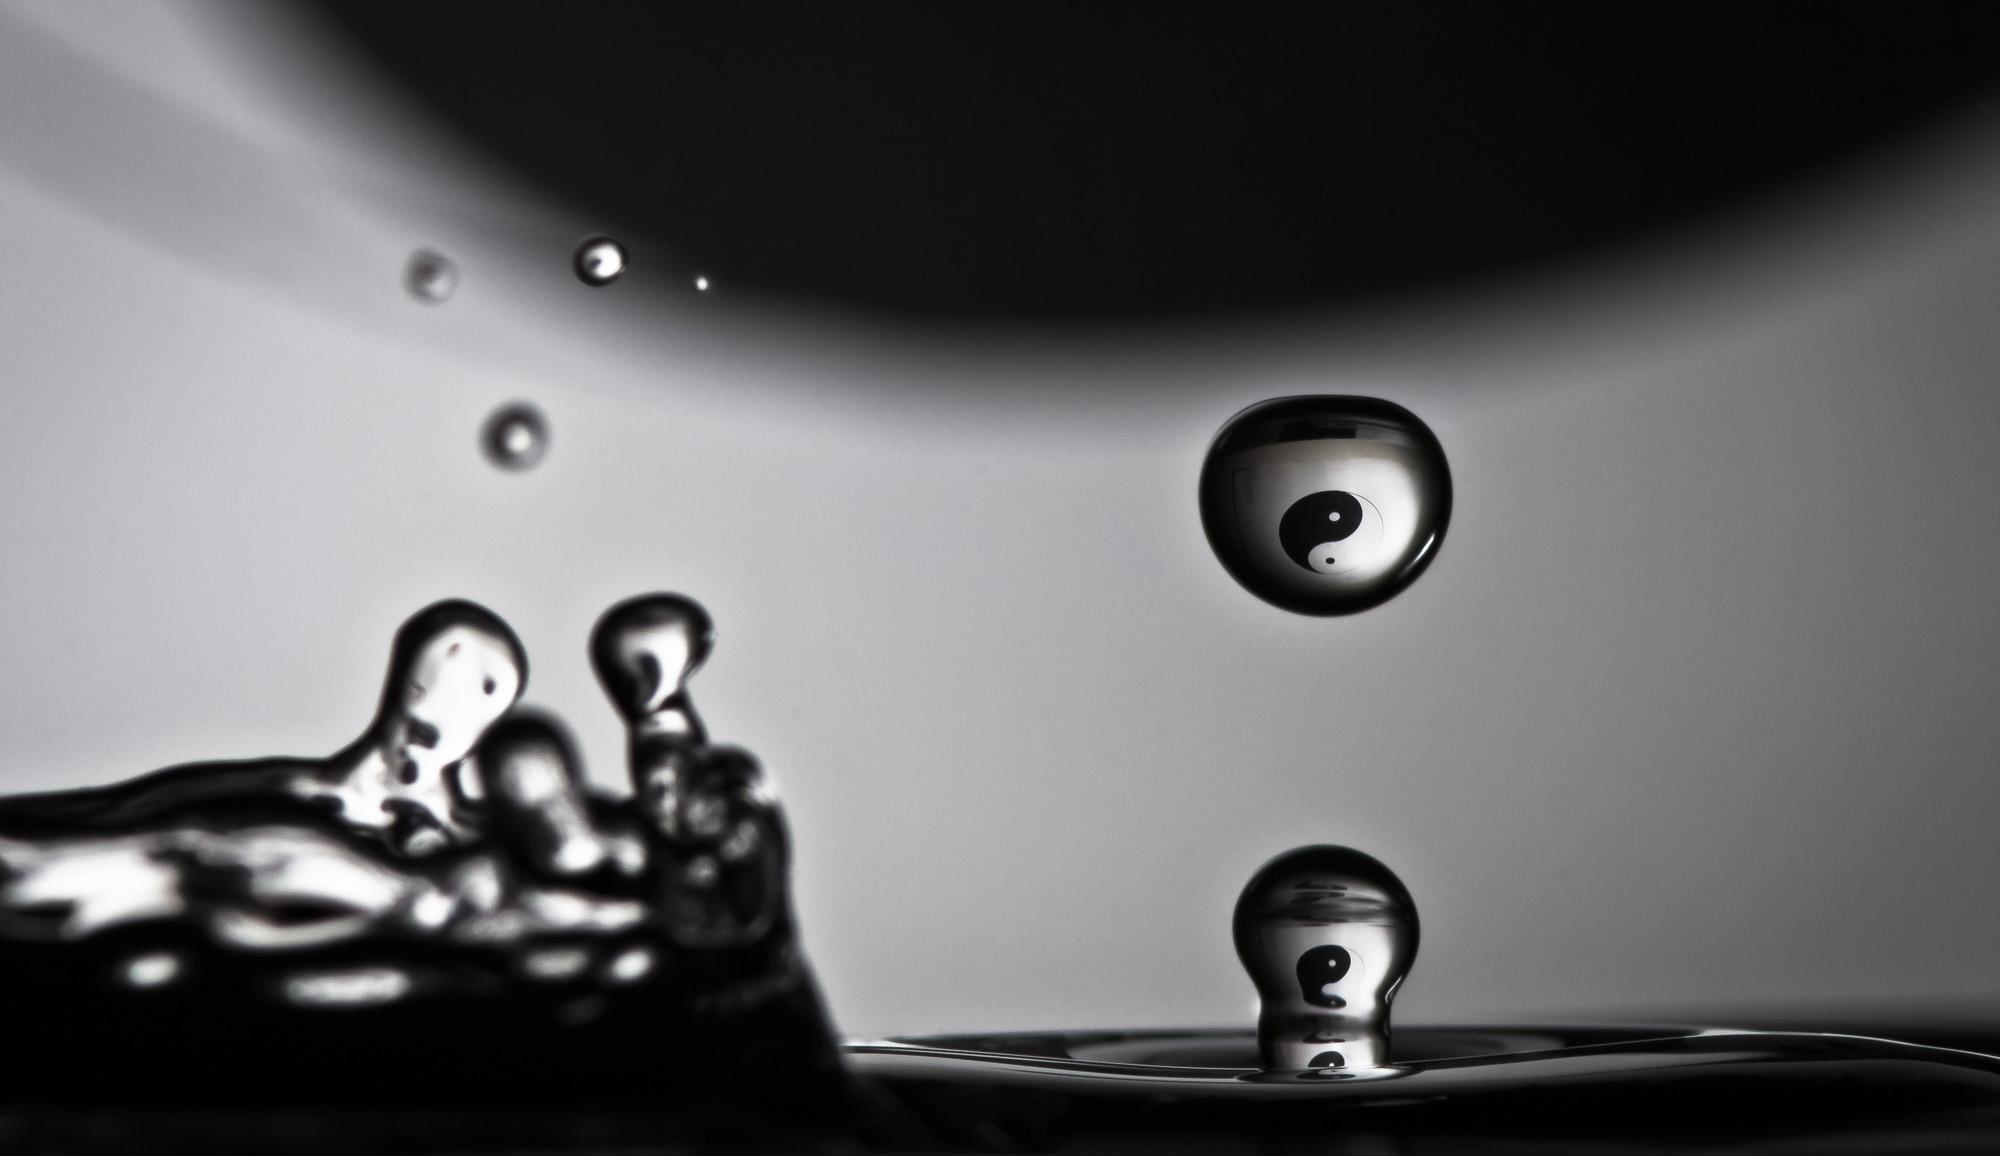 liquid_drops_3-113-Edit-2-portfolio2012_niklaswikstrom10016